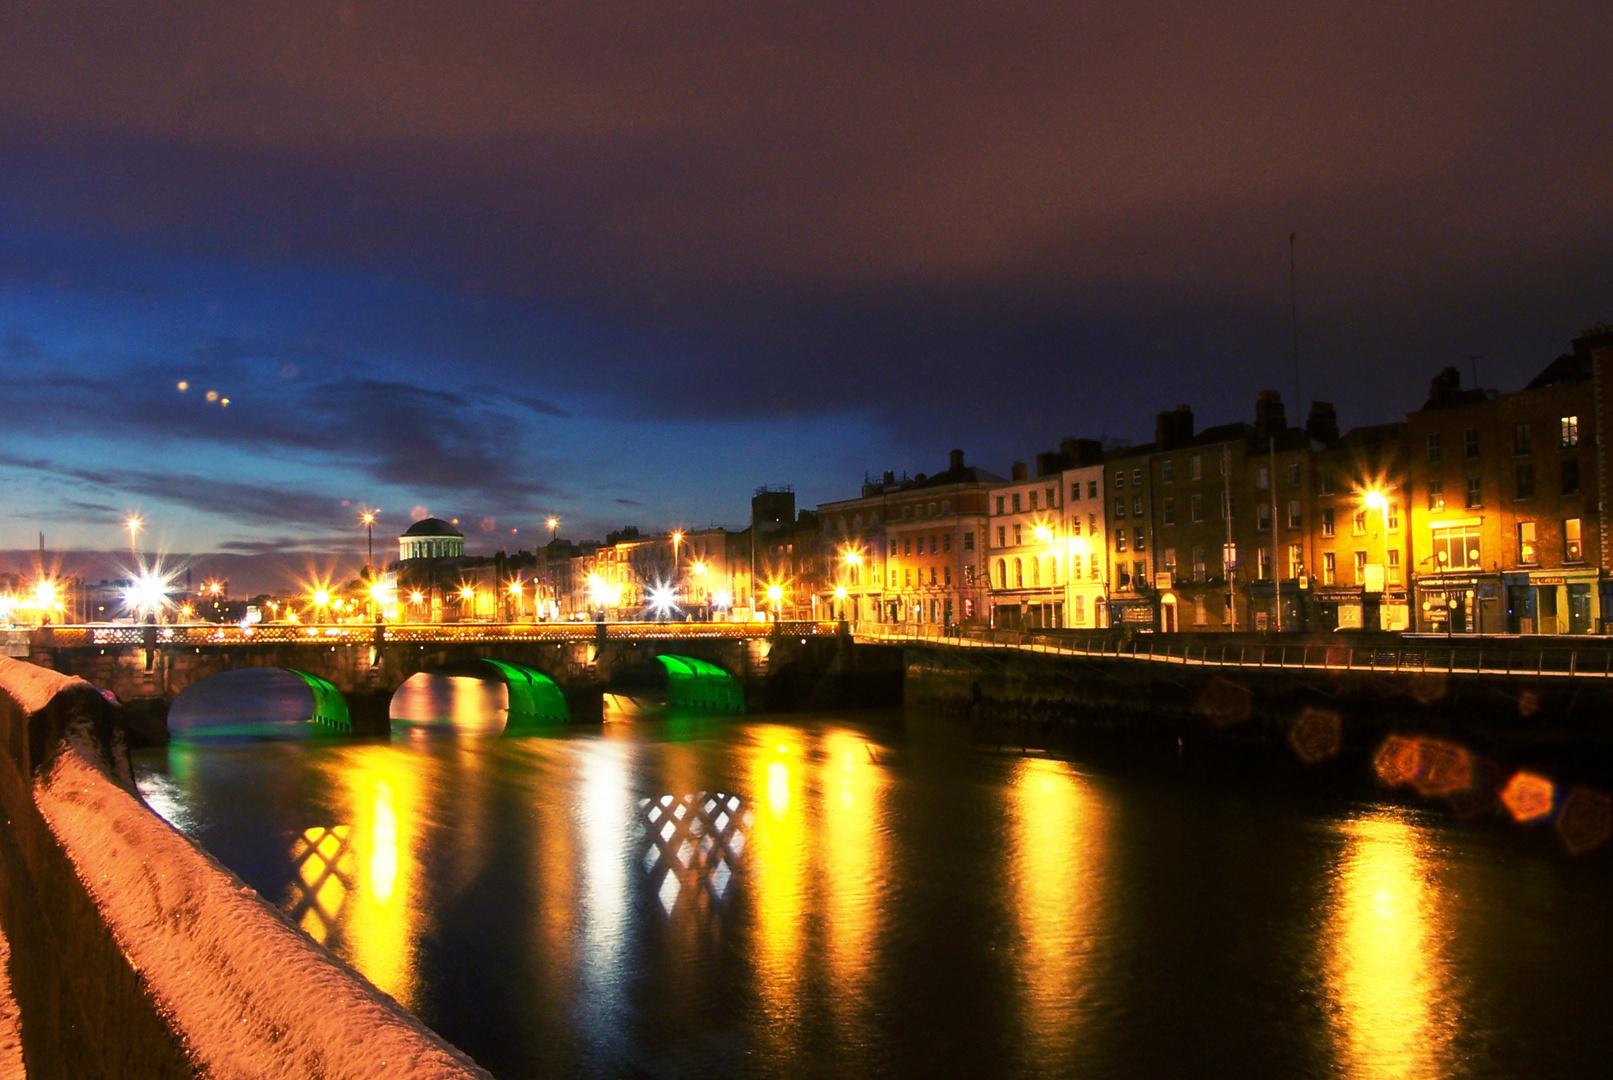 New Year's Eve at Dublin